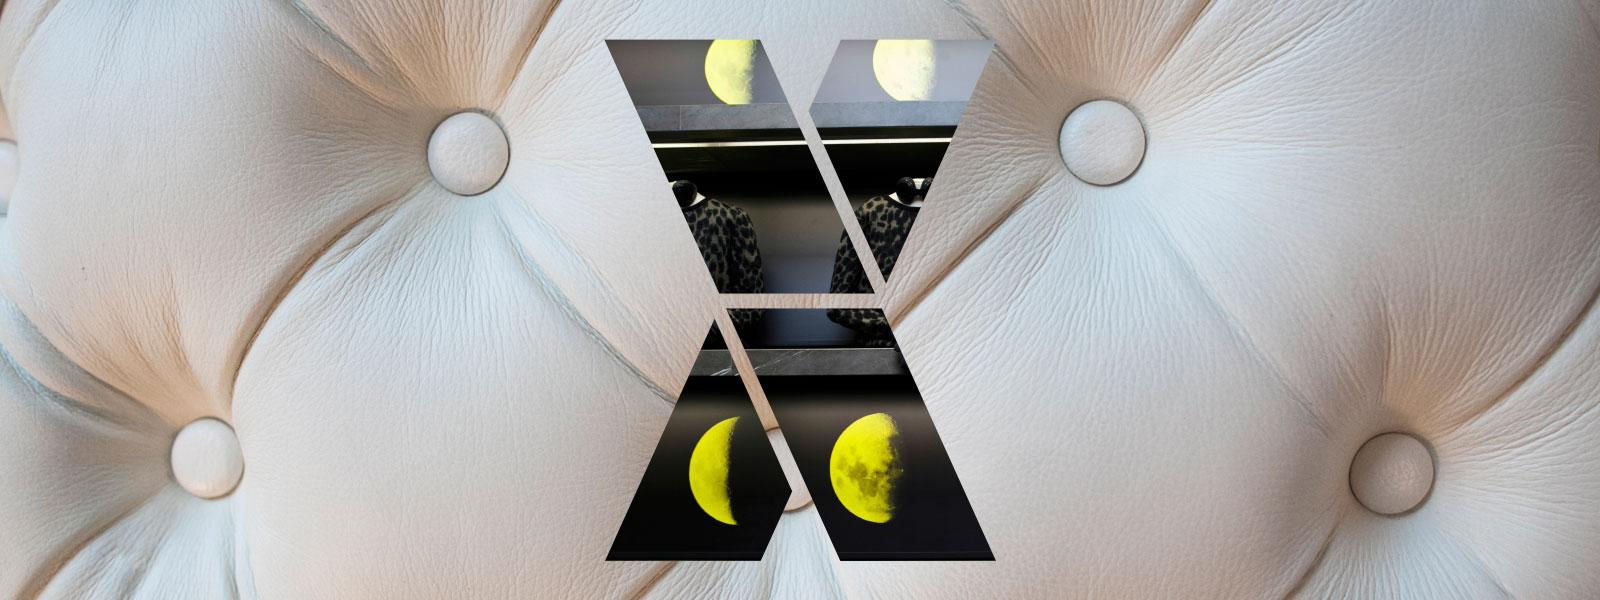 E arquitectos -NYCxDESIGN 2013